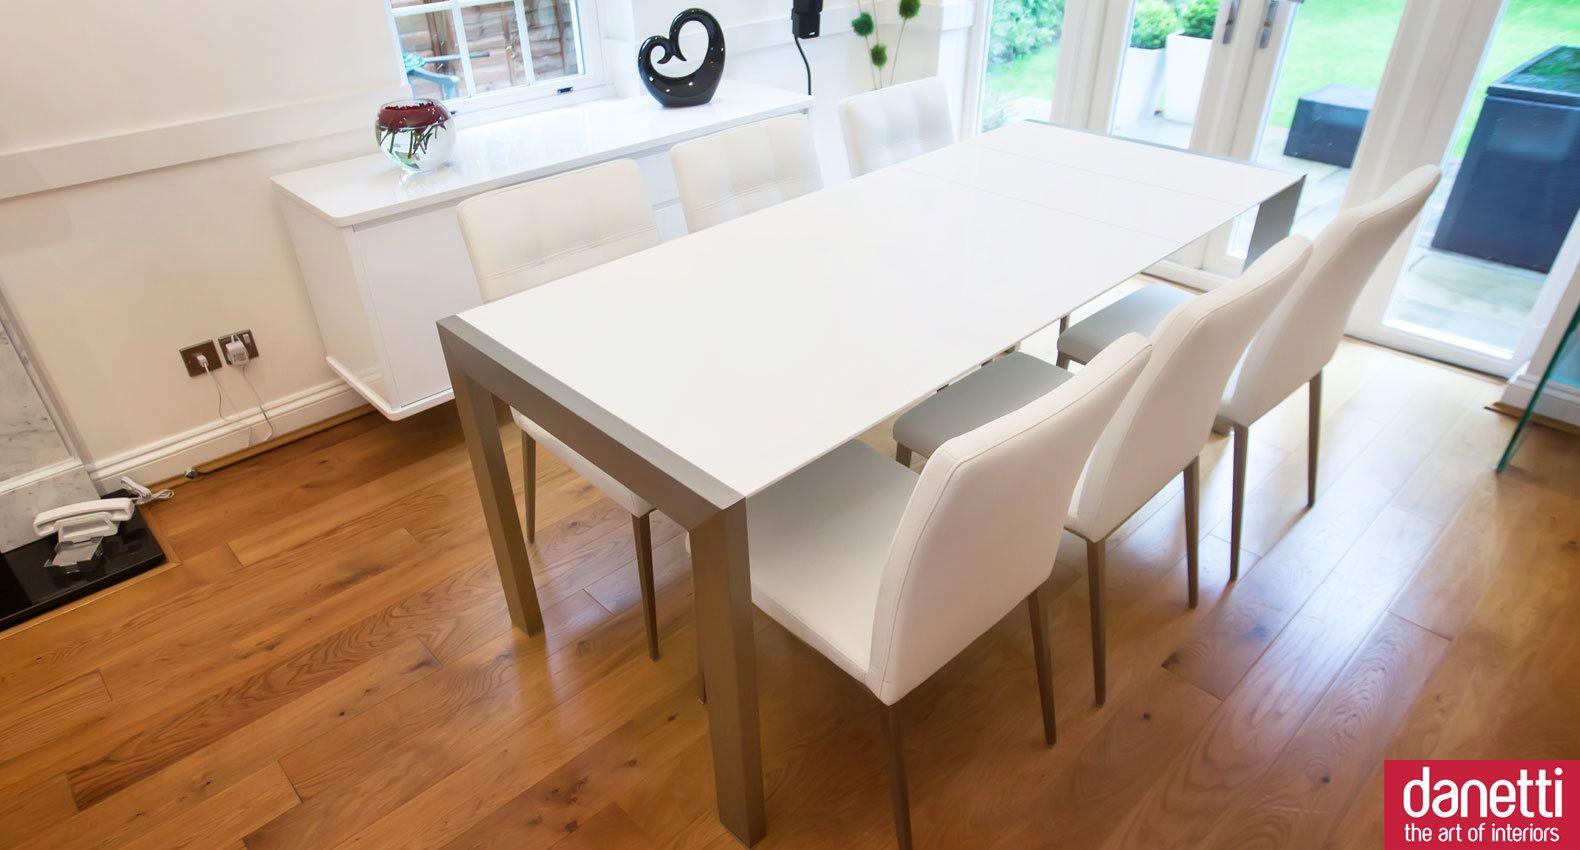 Matt White Extending Dining Table Brushed Metal Legs Seats 8